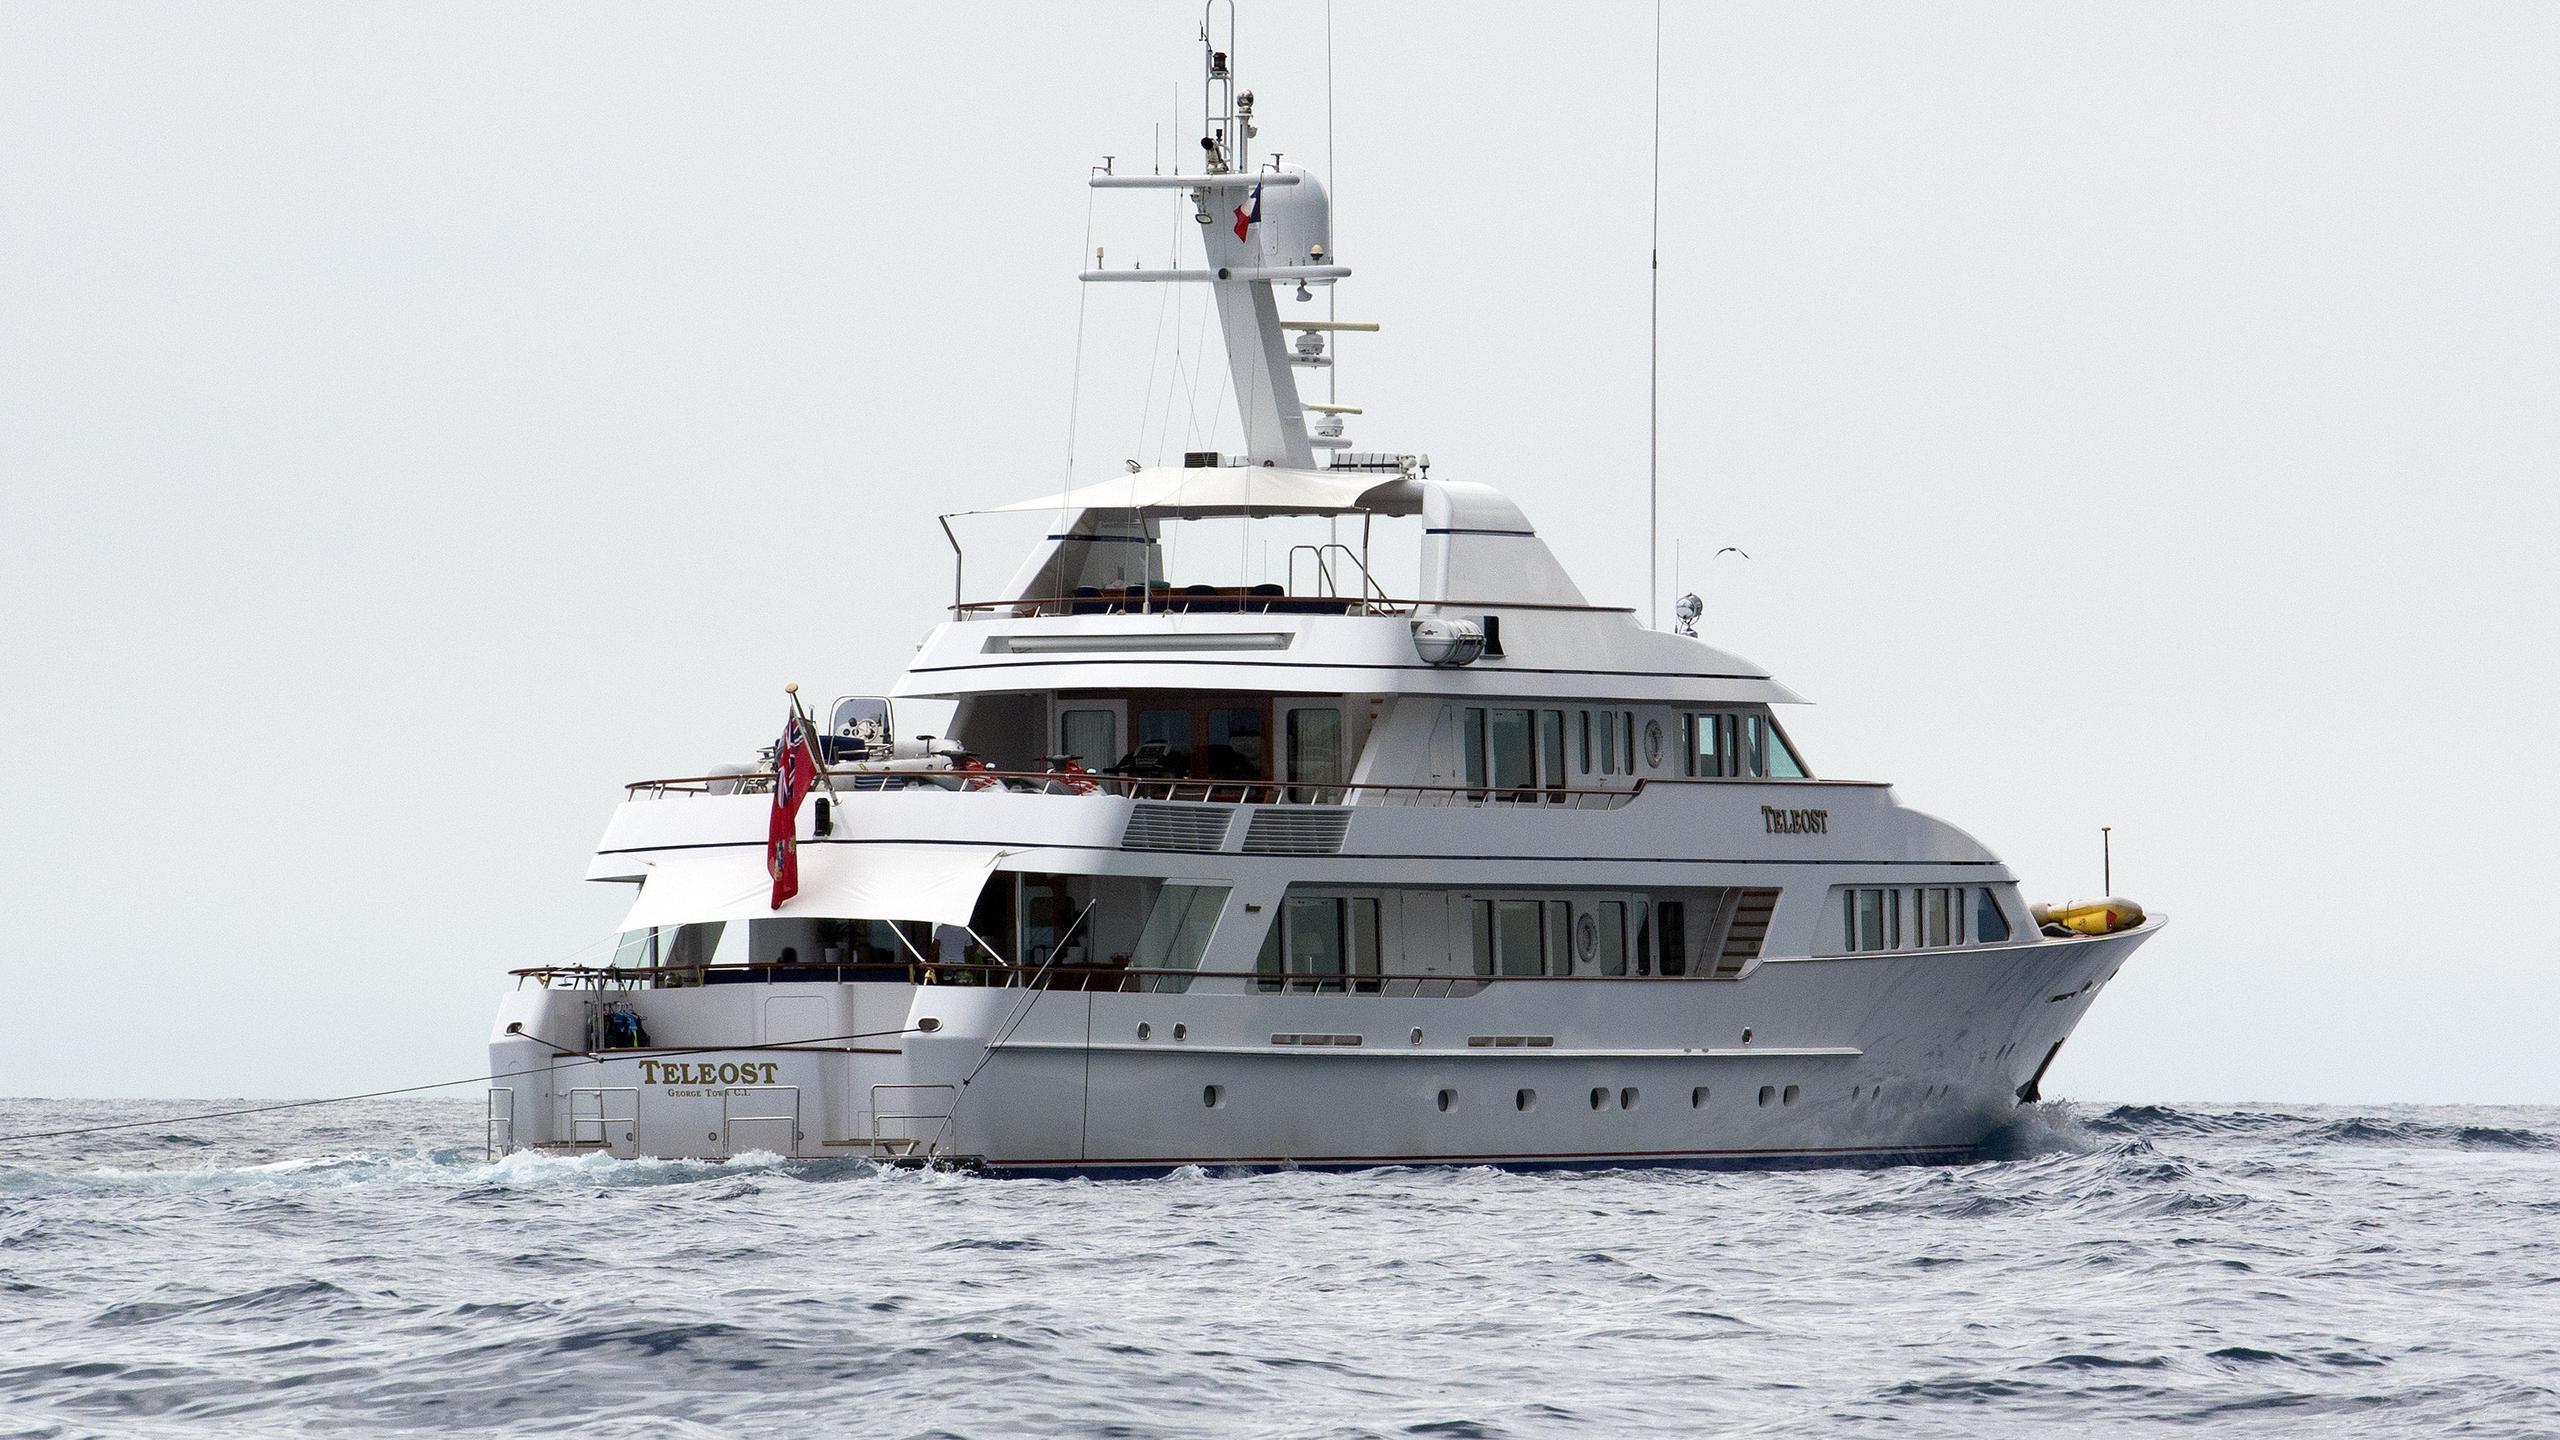 teleost-motor-yacht-feadship-1998-49m-stern